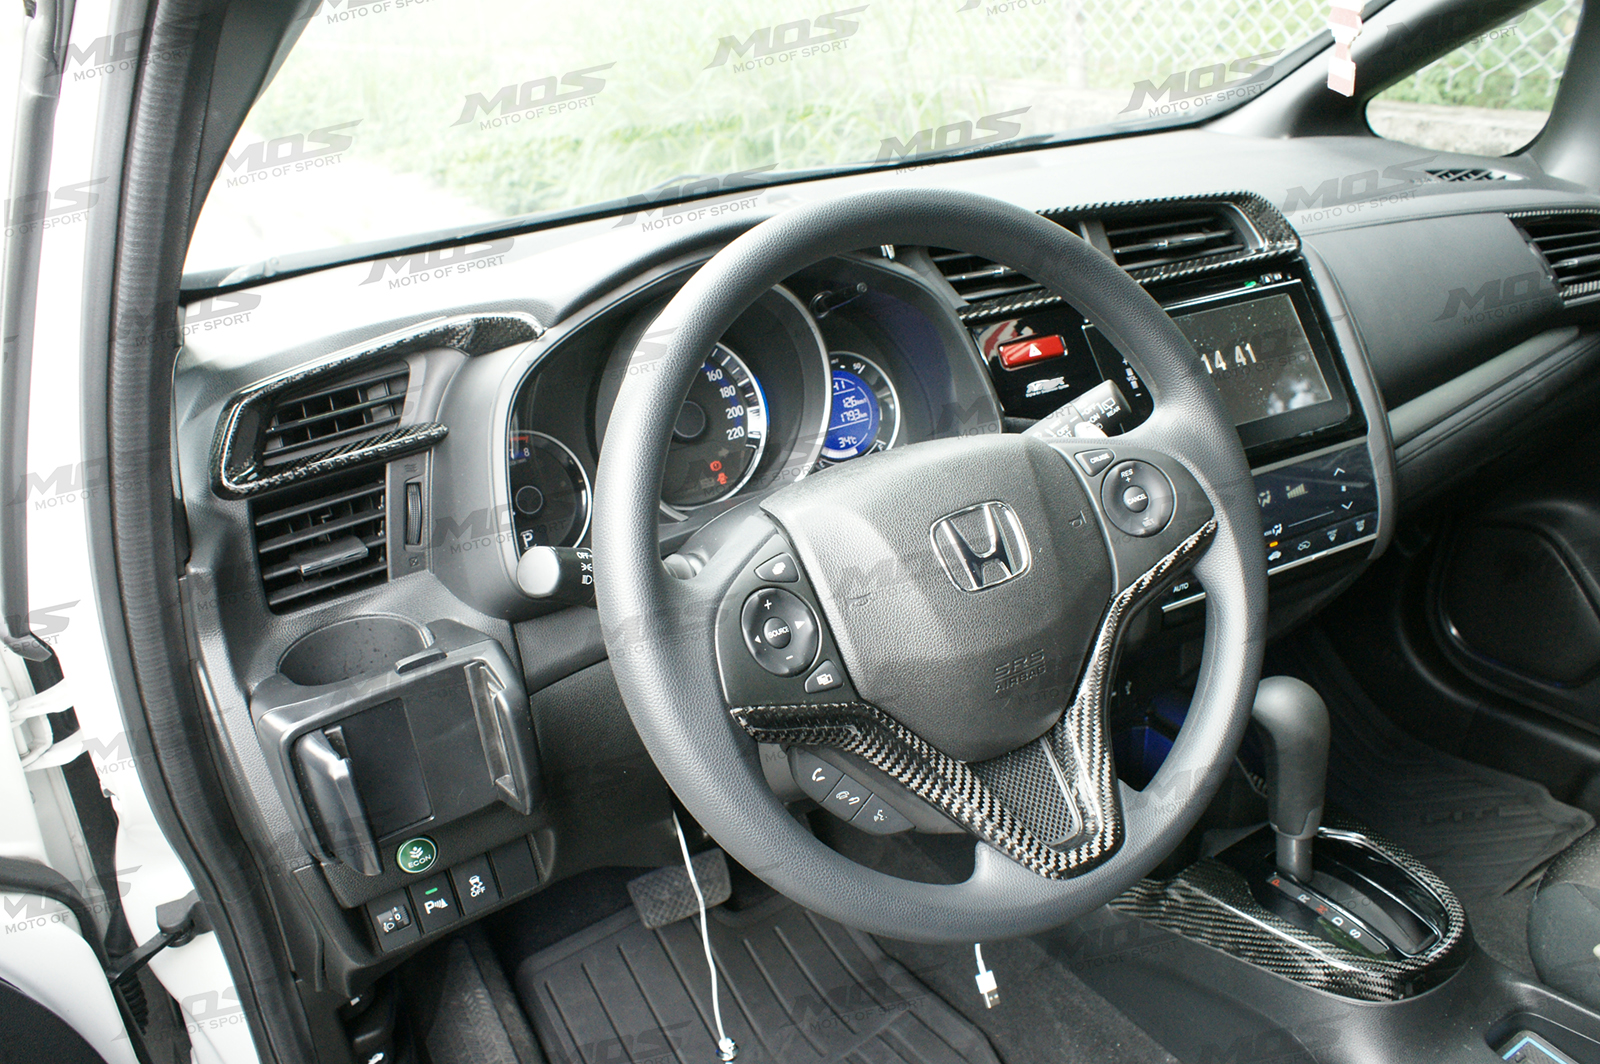 Carbon Fiber Steering Wheel Trim For Honda Fit 3rd Gen